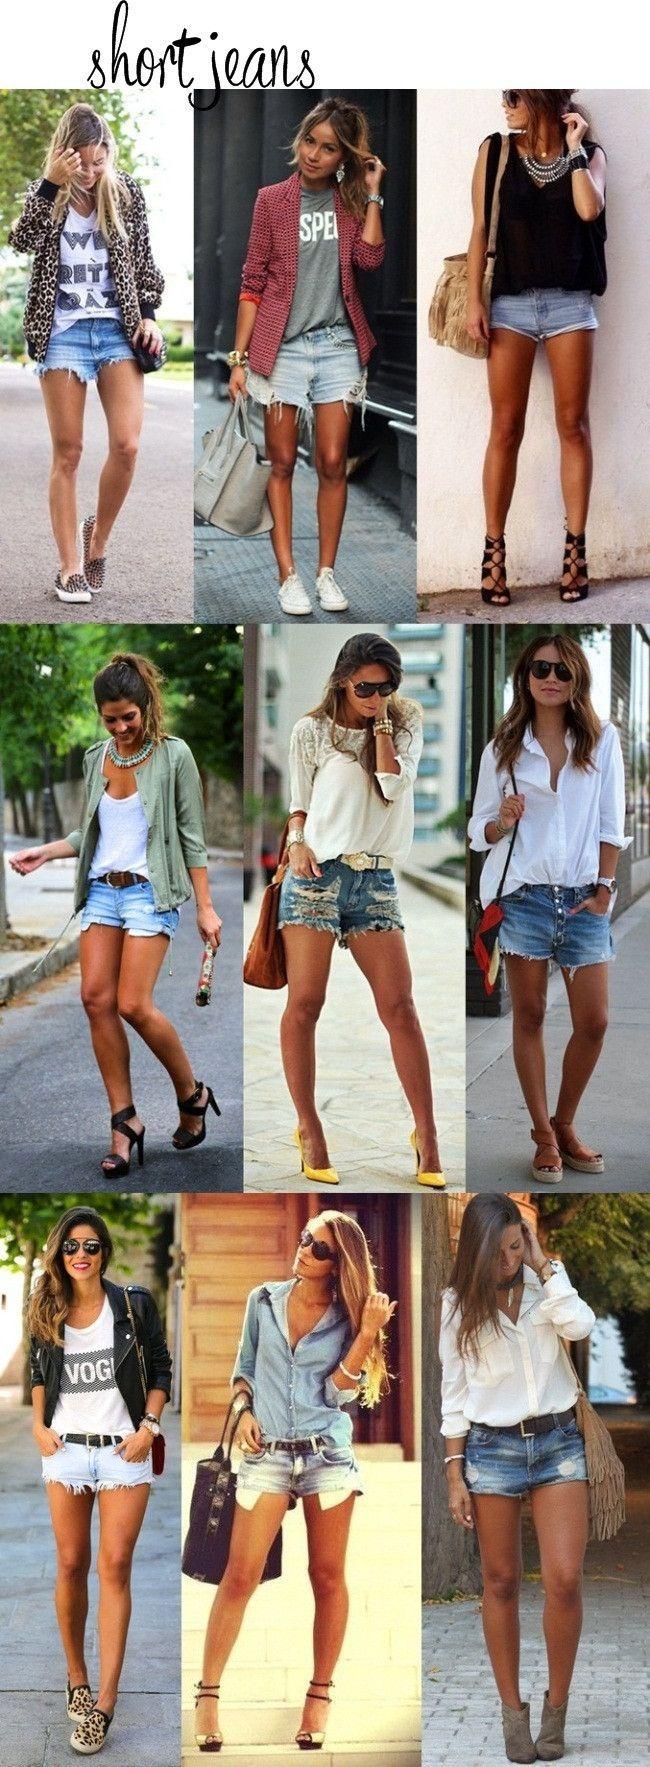 Amor eterno: Short Jeans